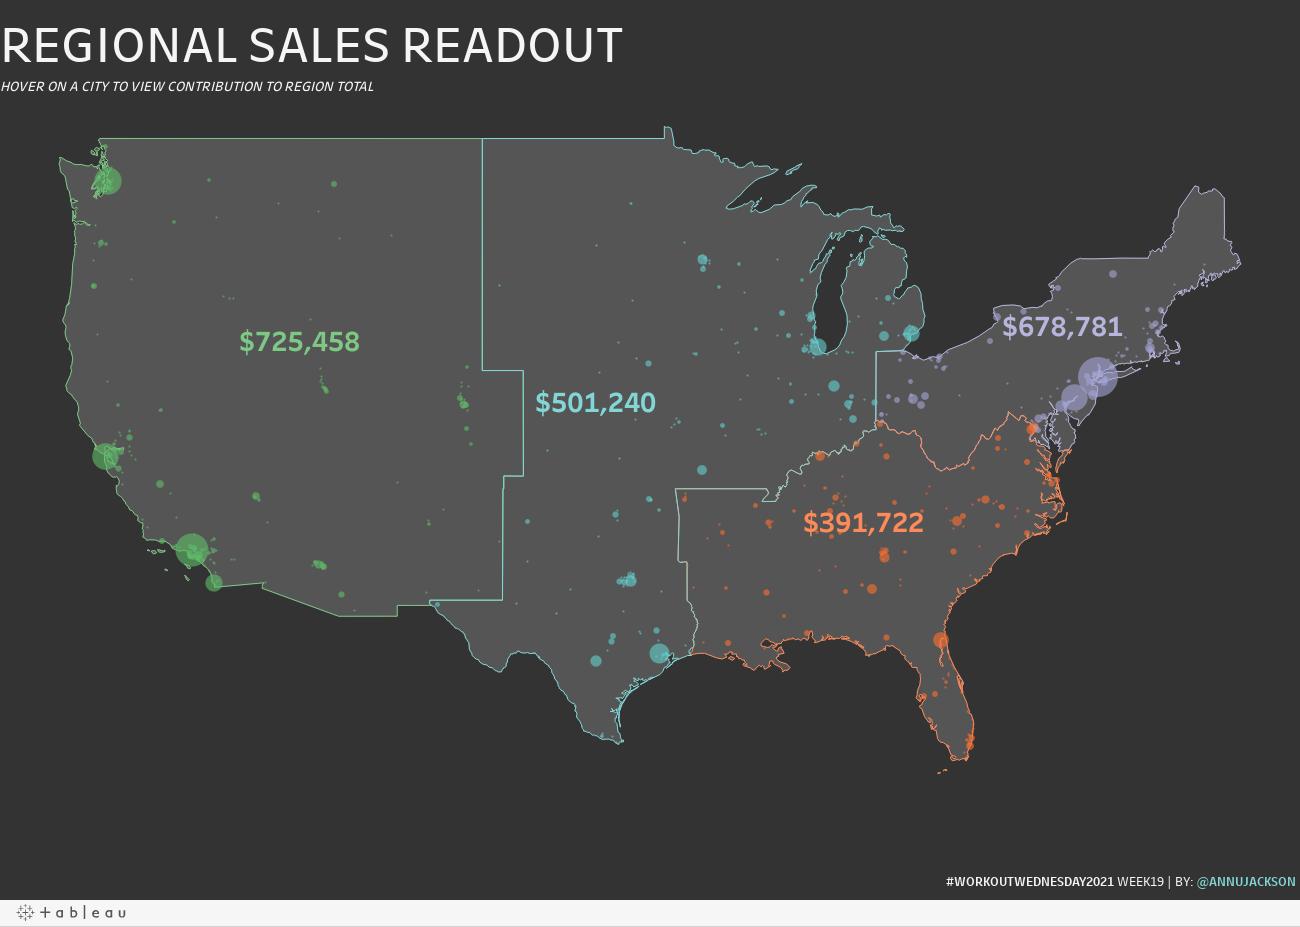 #WorkoutWednesday2021 Week 19 | Regional Sales Readout